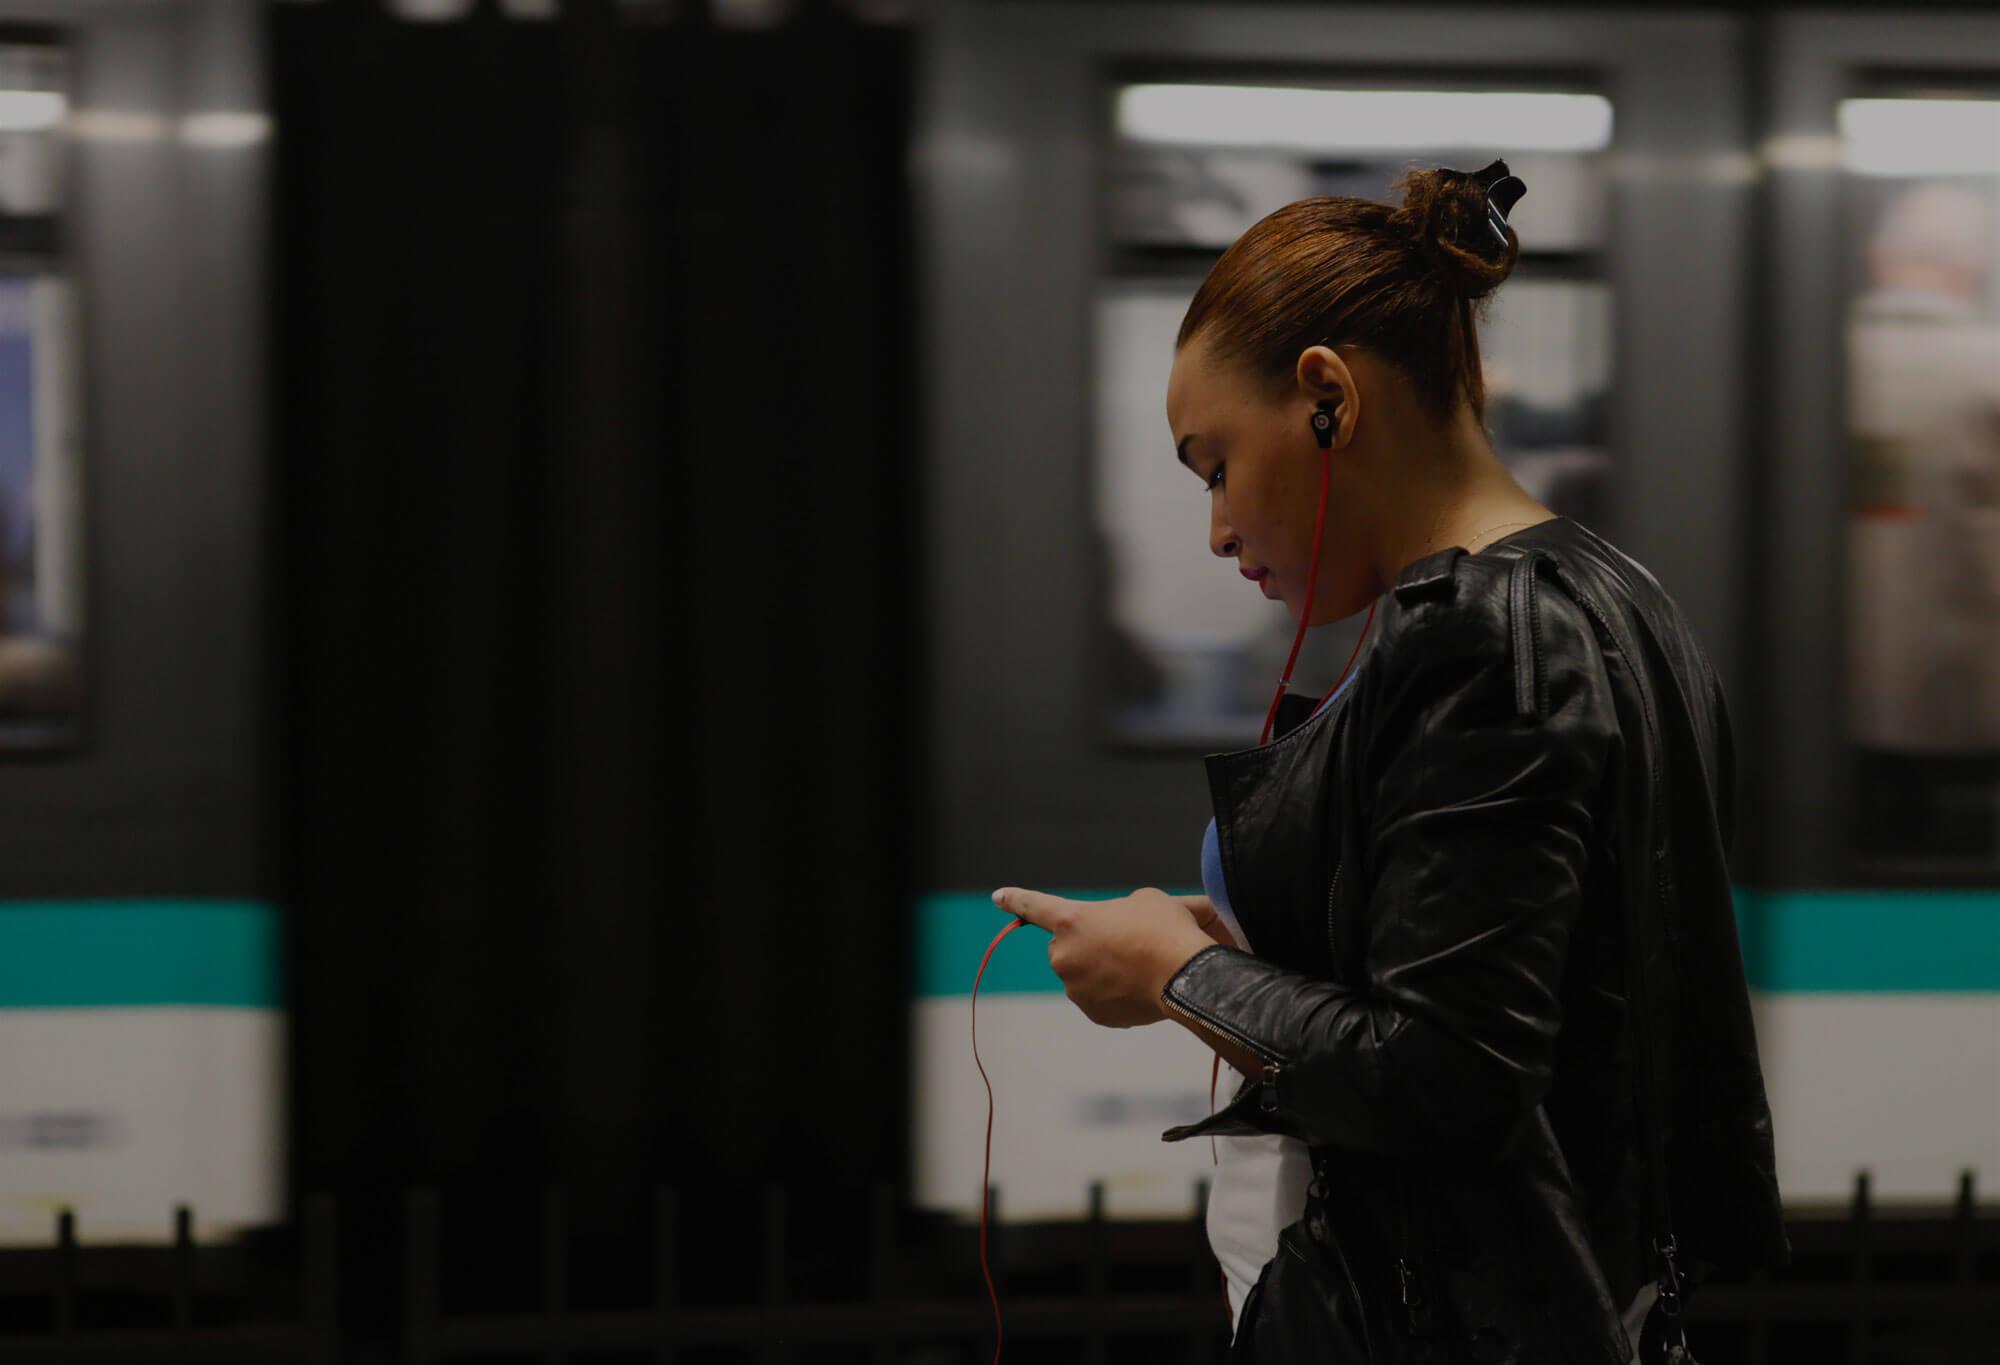 Pole emploi - offre emploi Technicien frigoriste (H/F) - Sucy-En-Brie